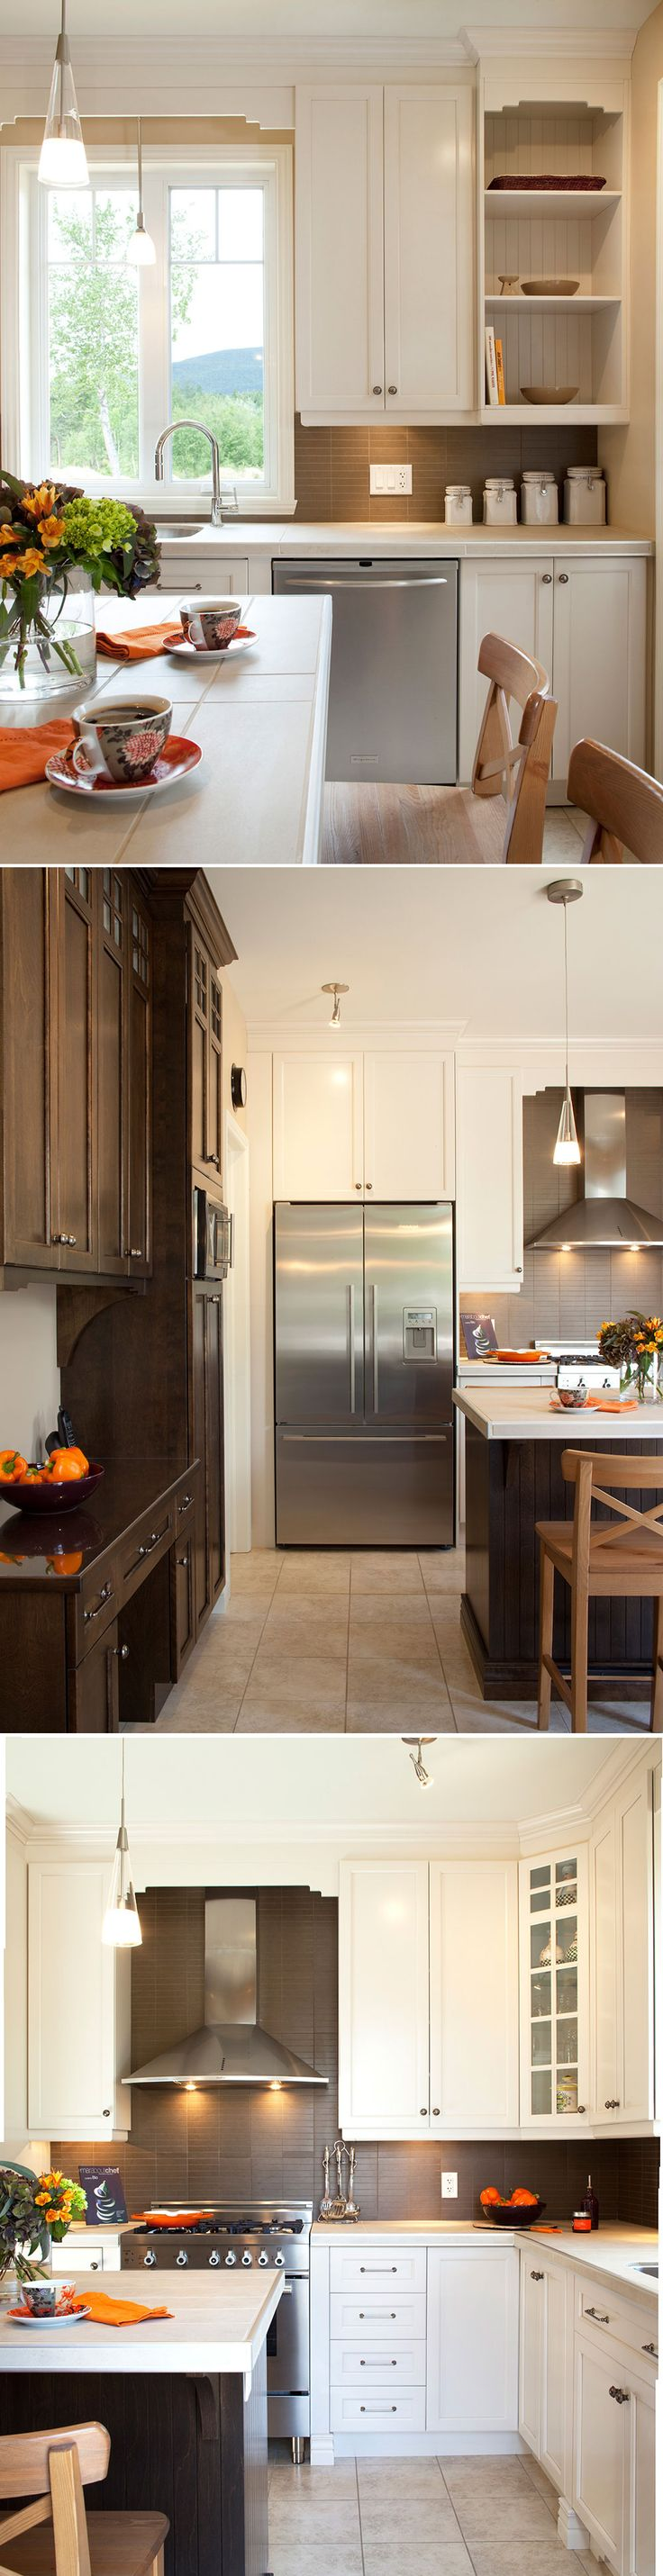 15 best images about cuisines classiques on pinterest fonts gold and un. Black Bedroom Furniture Sets. Home Design Ideas